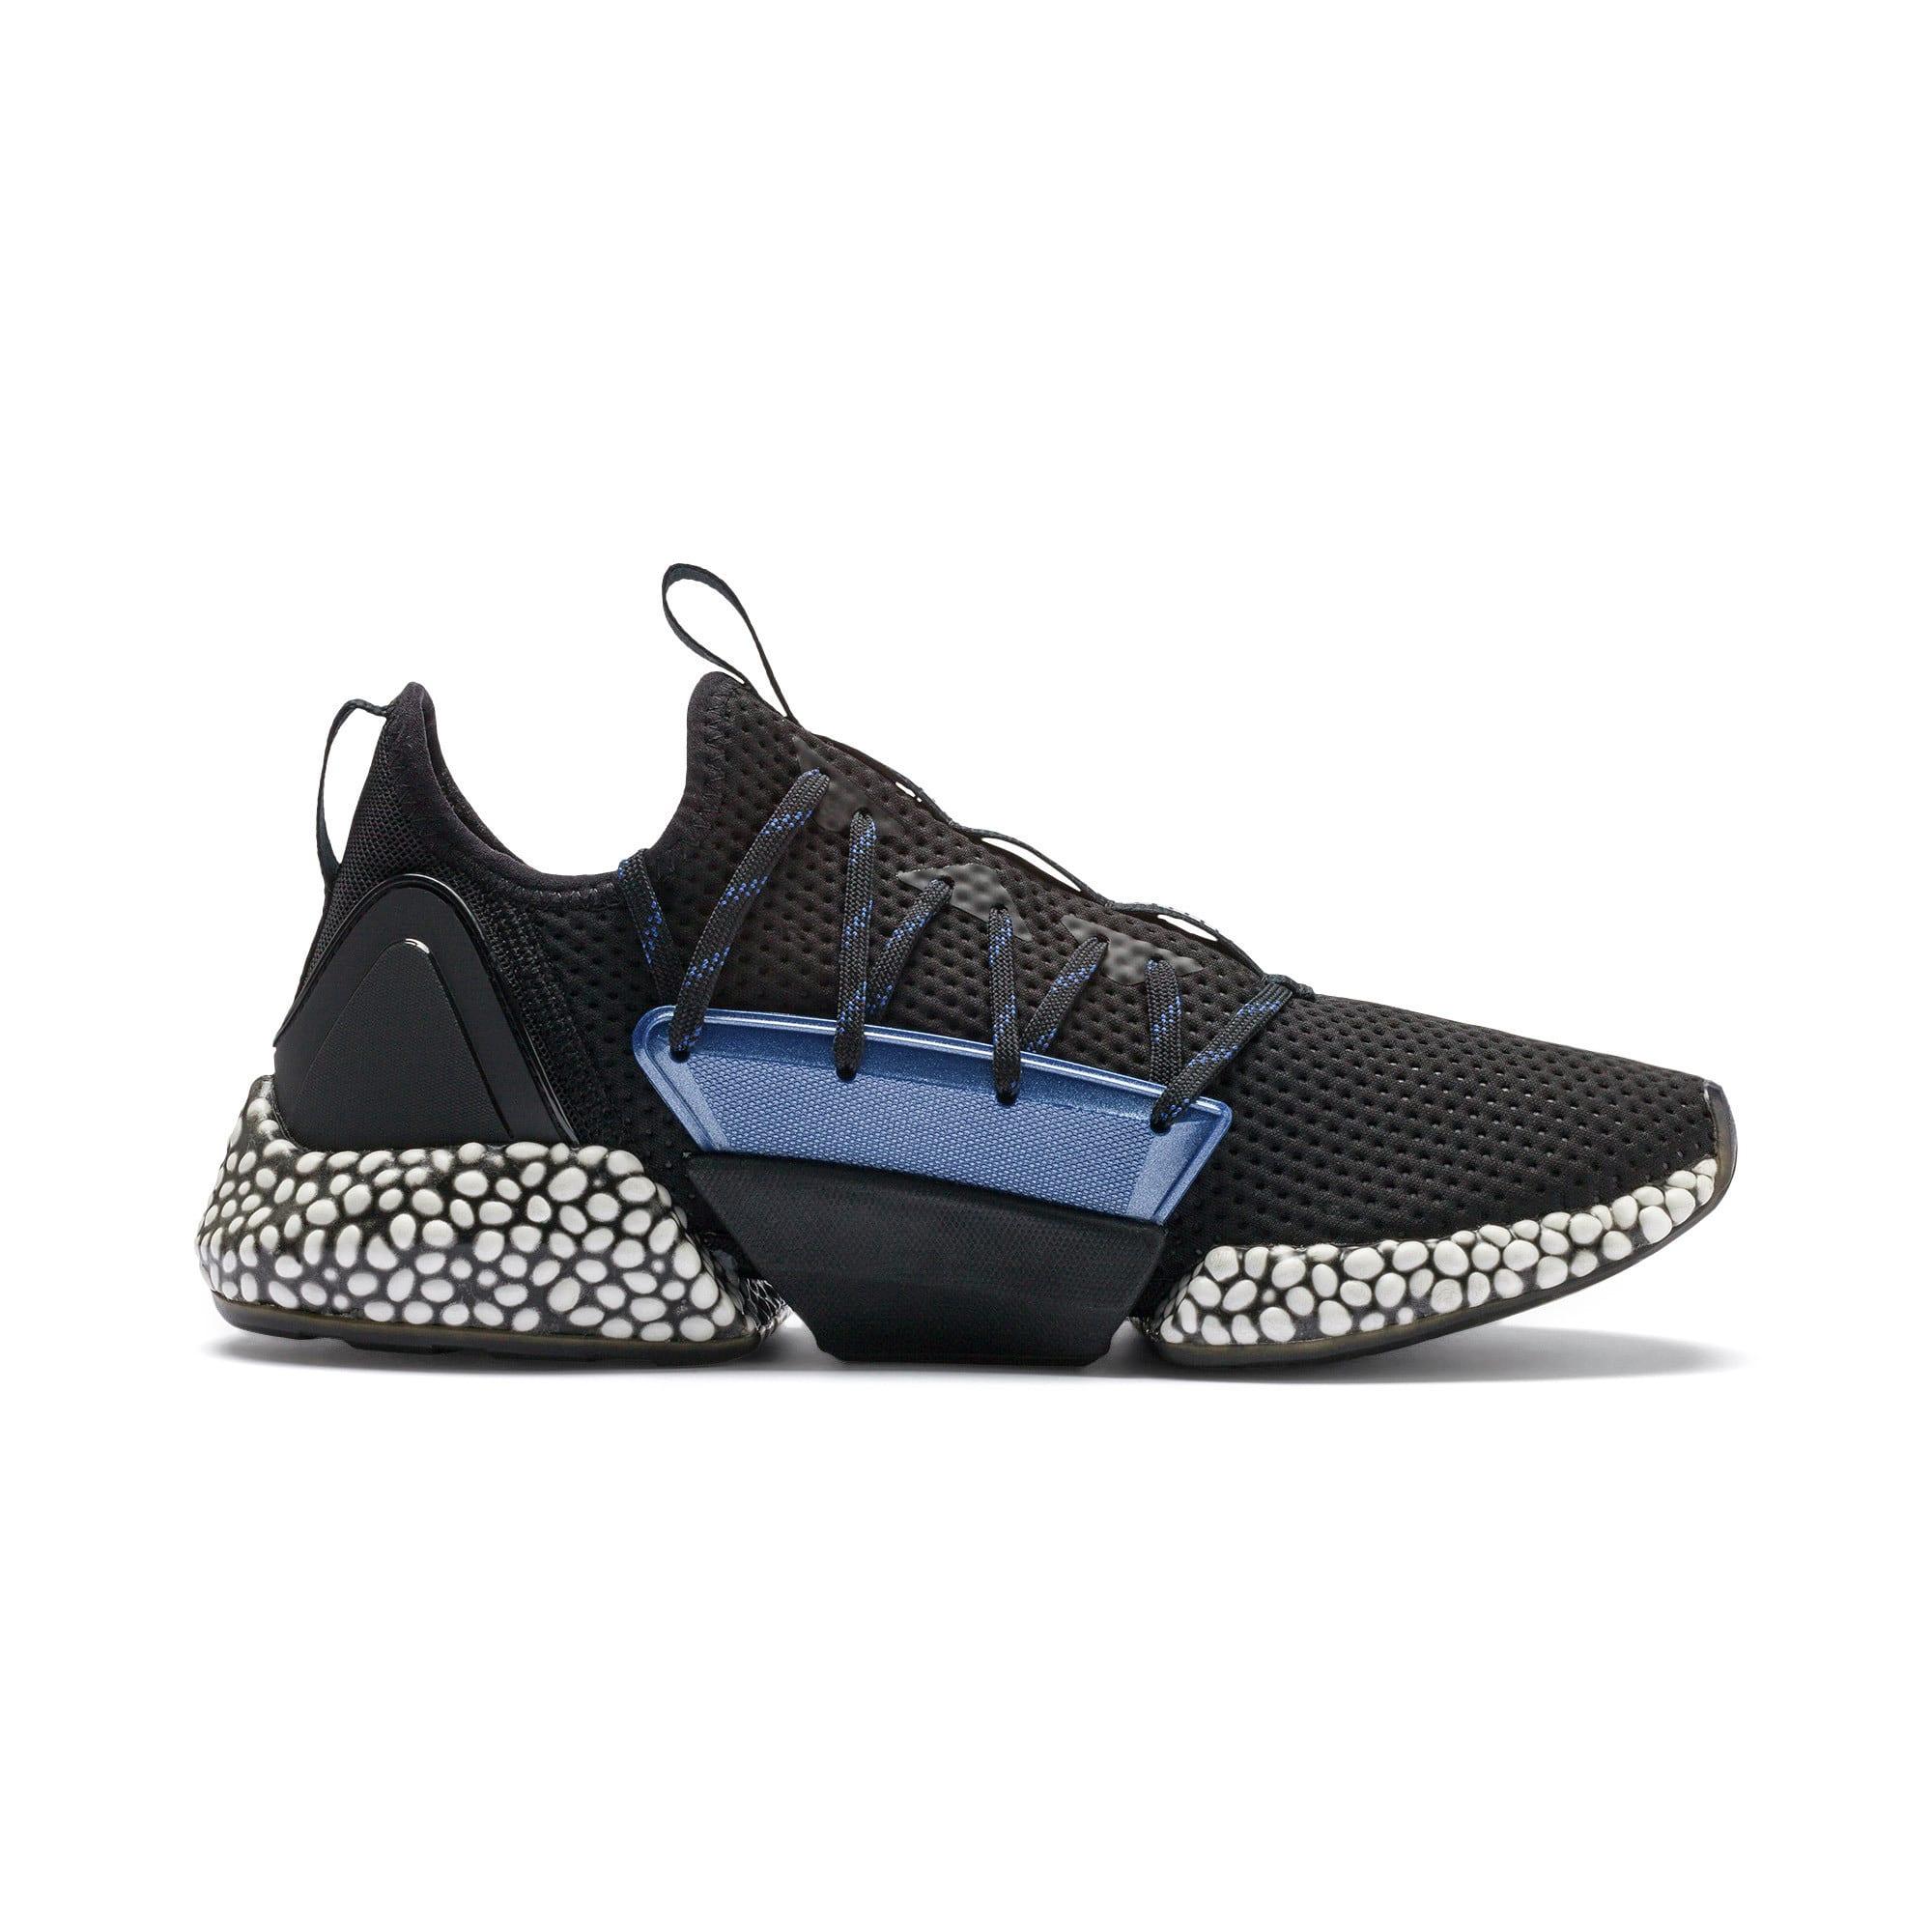 Thumbnail 6 of HYBRID Rocket Aero Men's Running Shoes, Puma Black-Galaxy Blue, medium